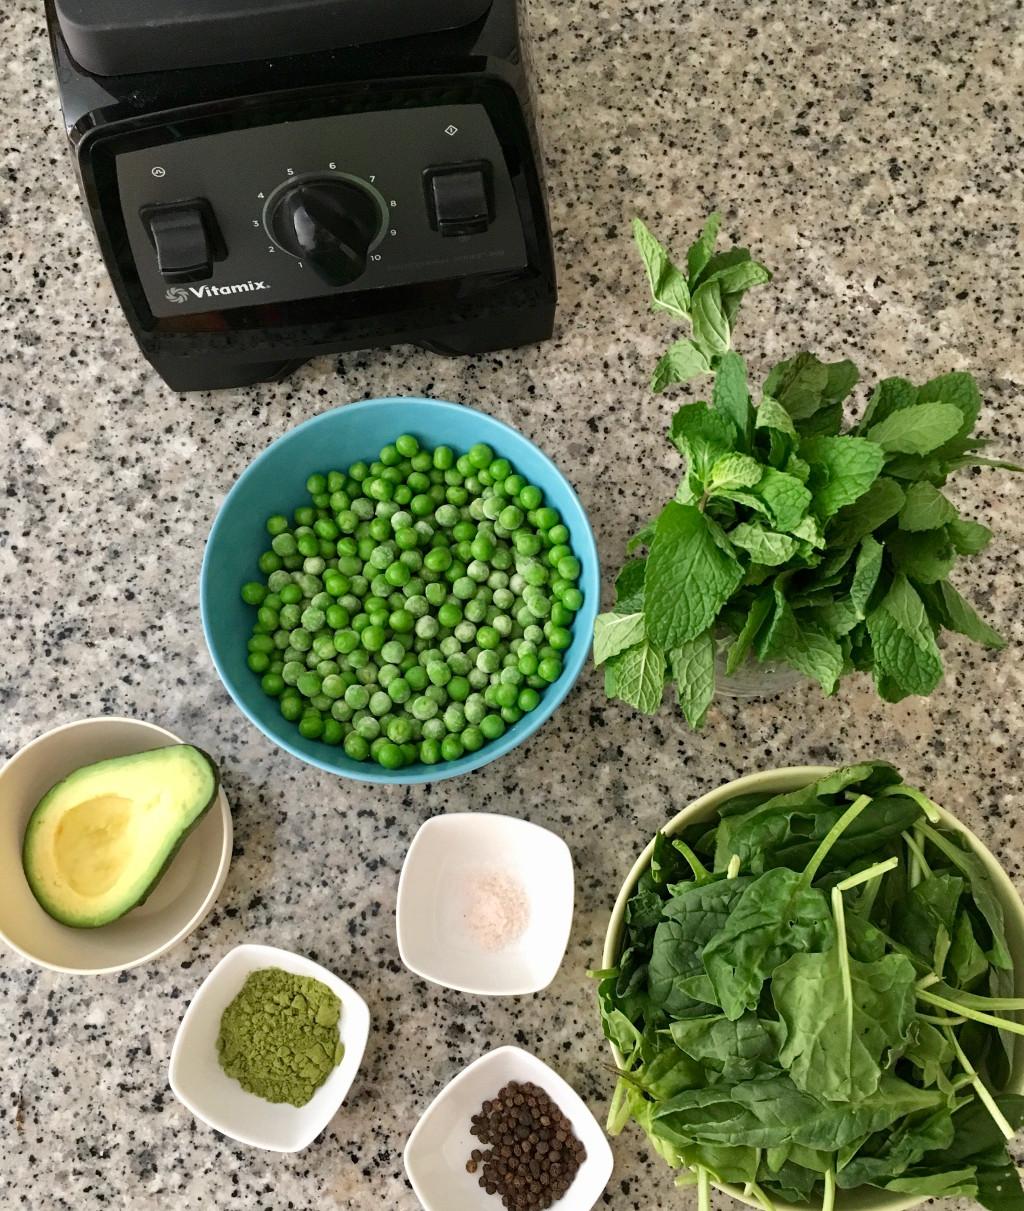 Green_Peas_Vitamix